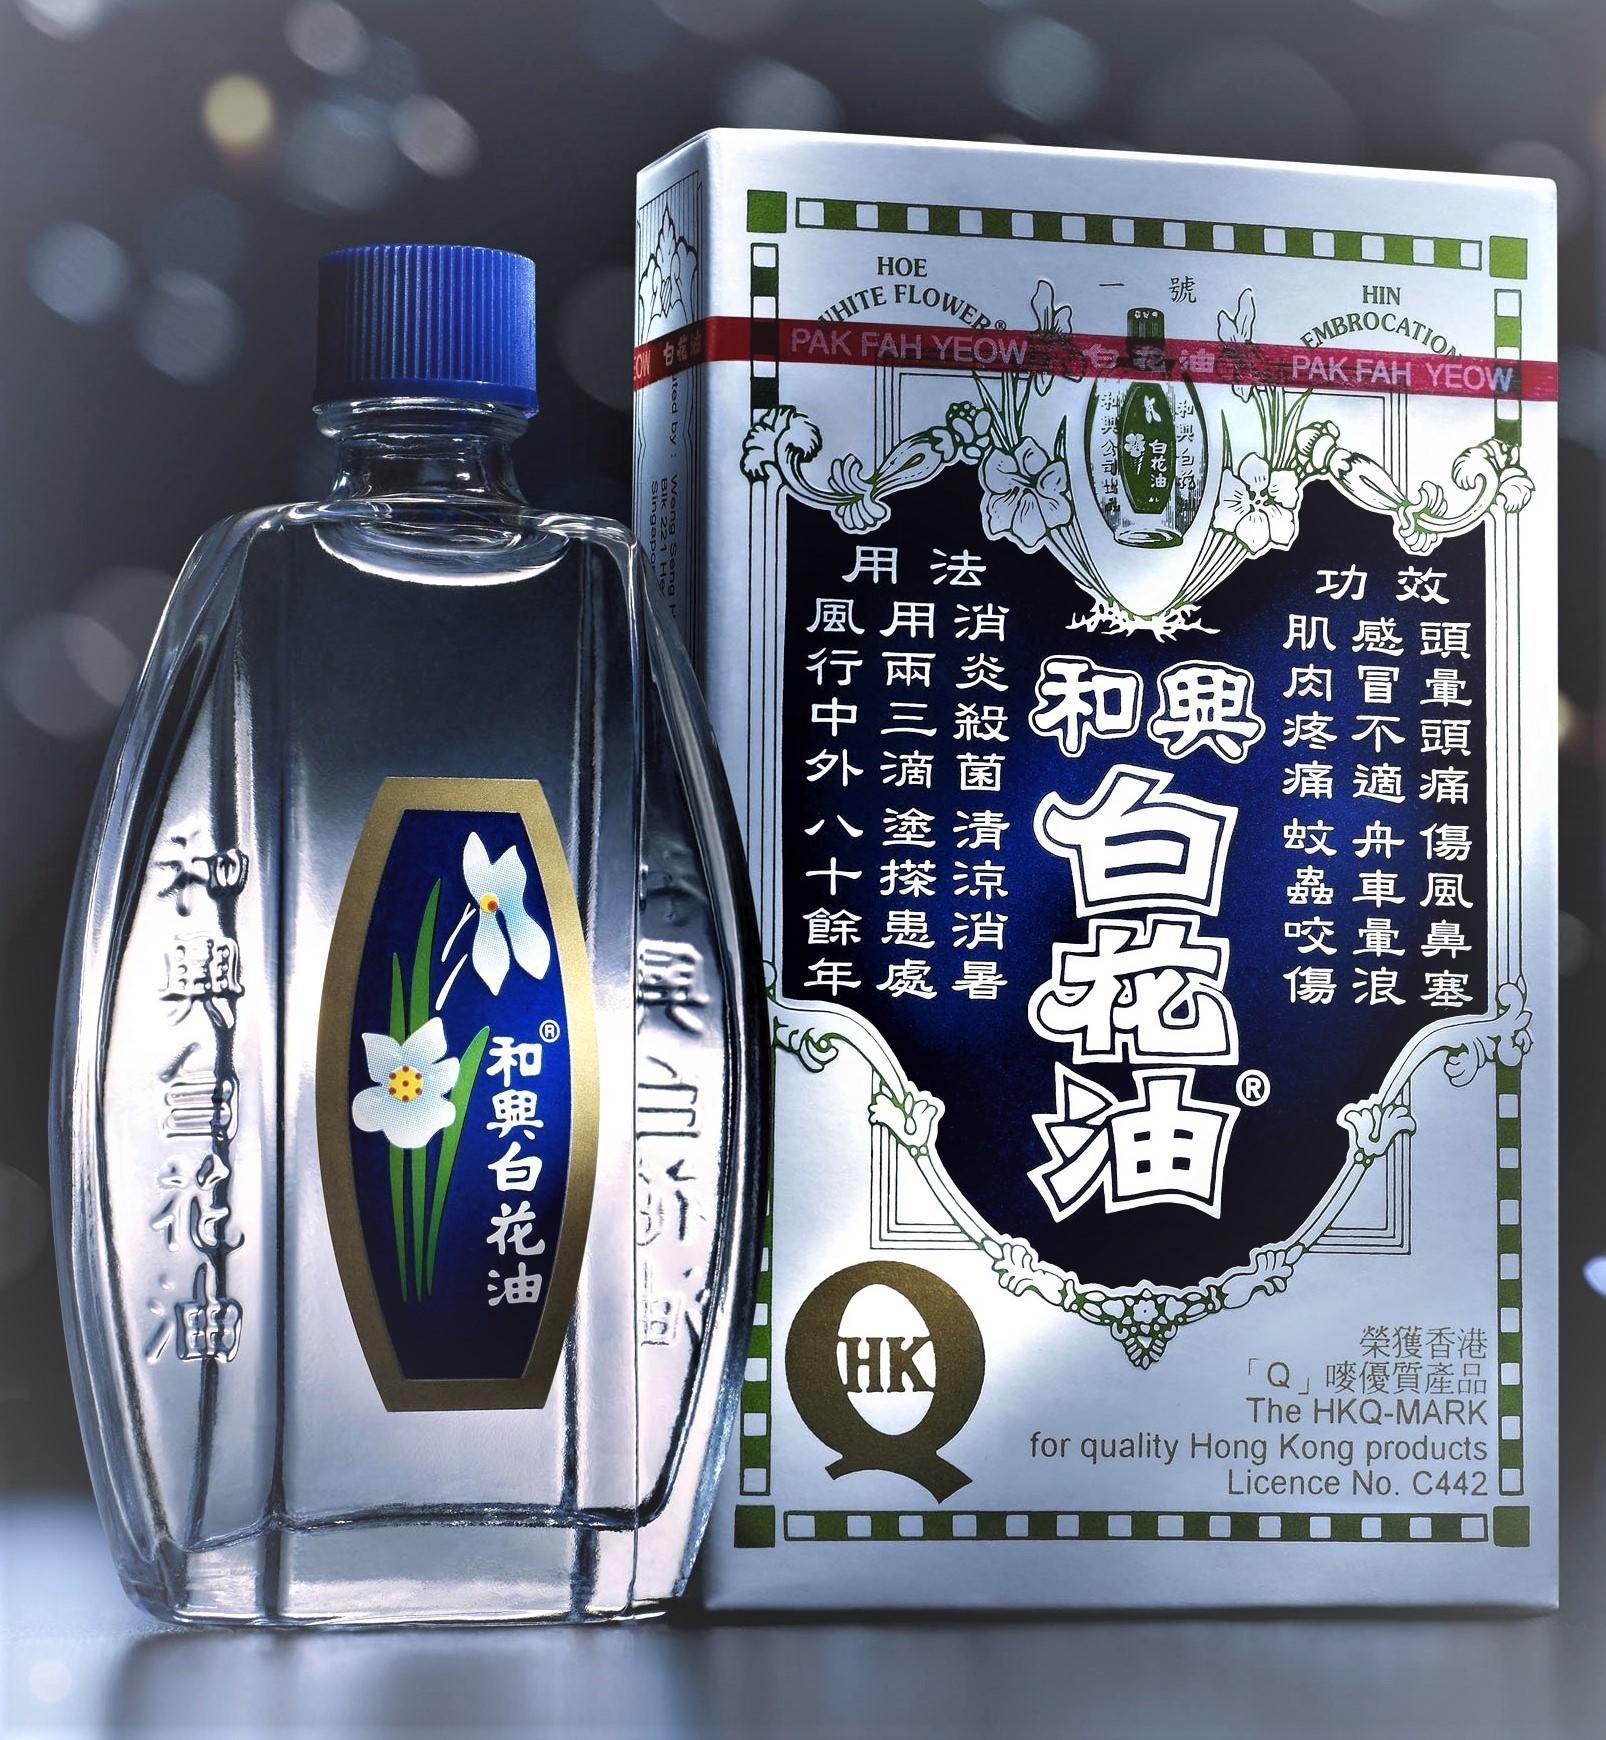 Bai hua you aka pak fah yeow and white flower oil patent formula aka pak fah yeow and white flower oil mightylinksfo